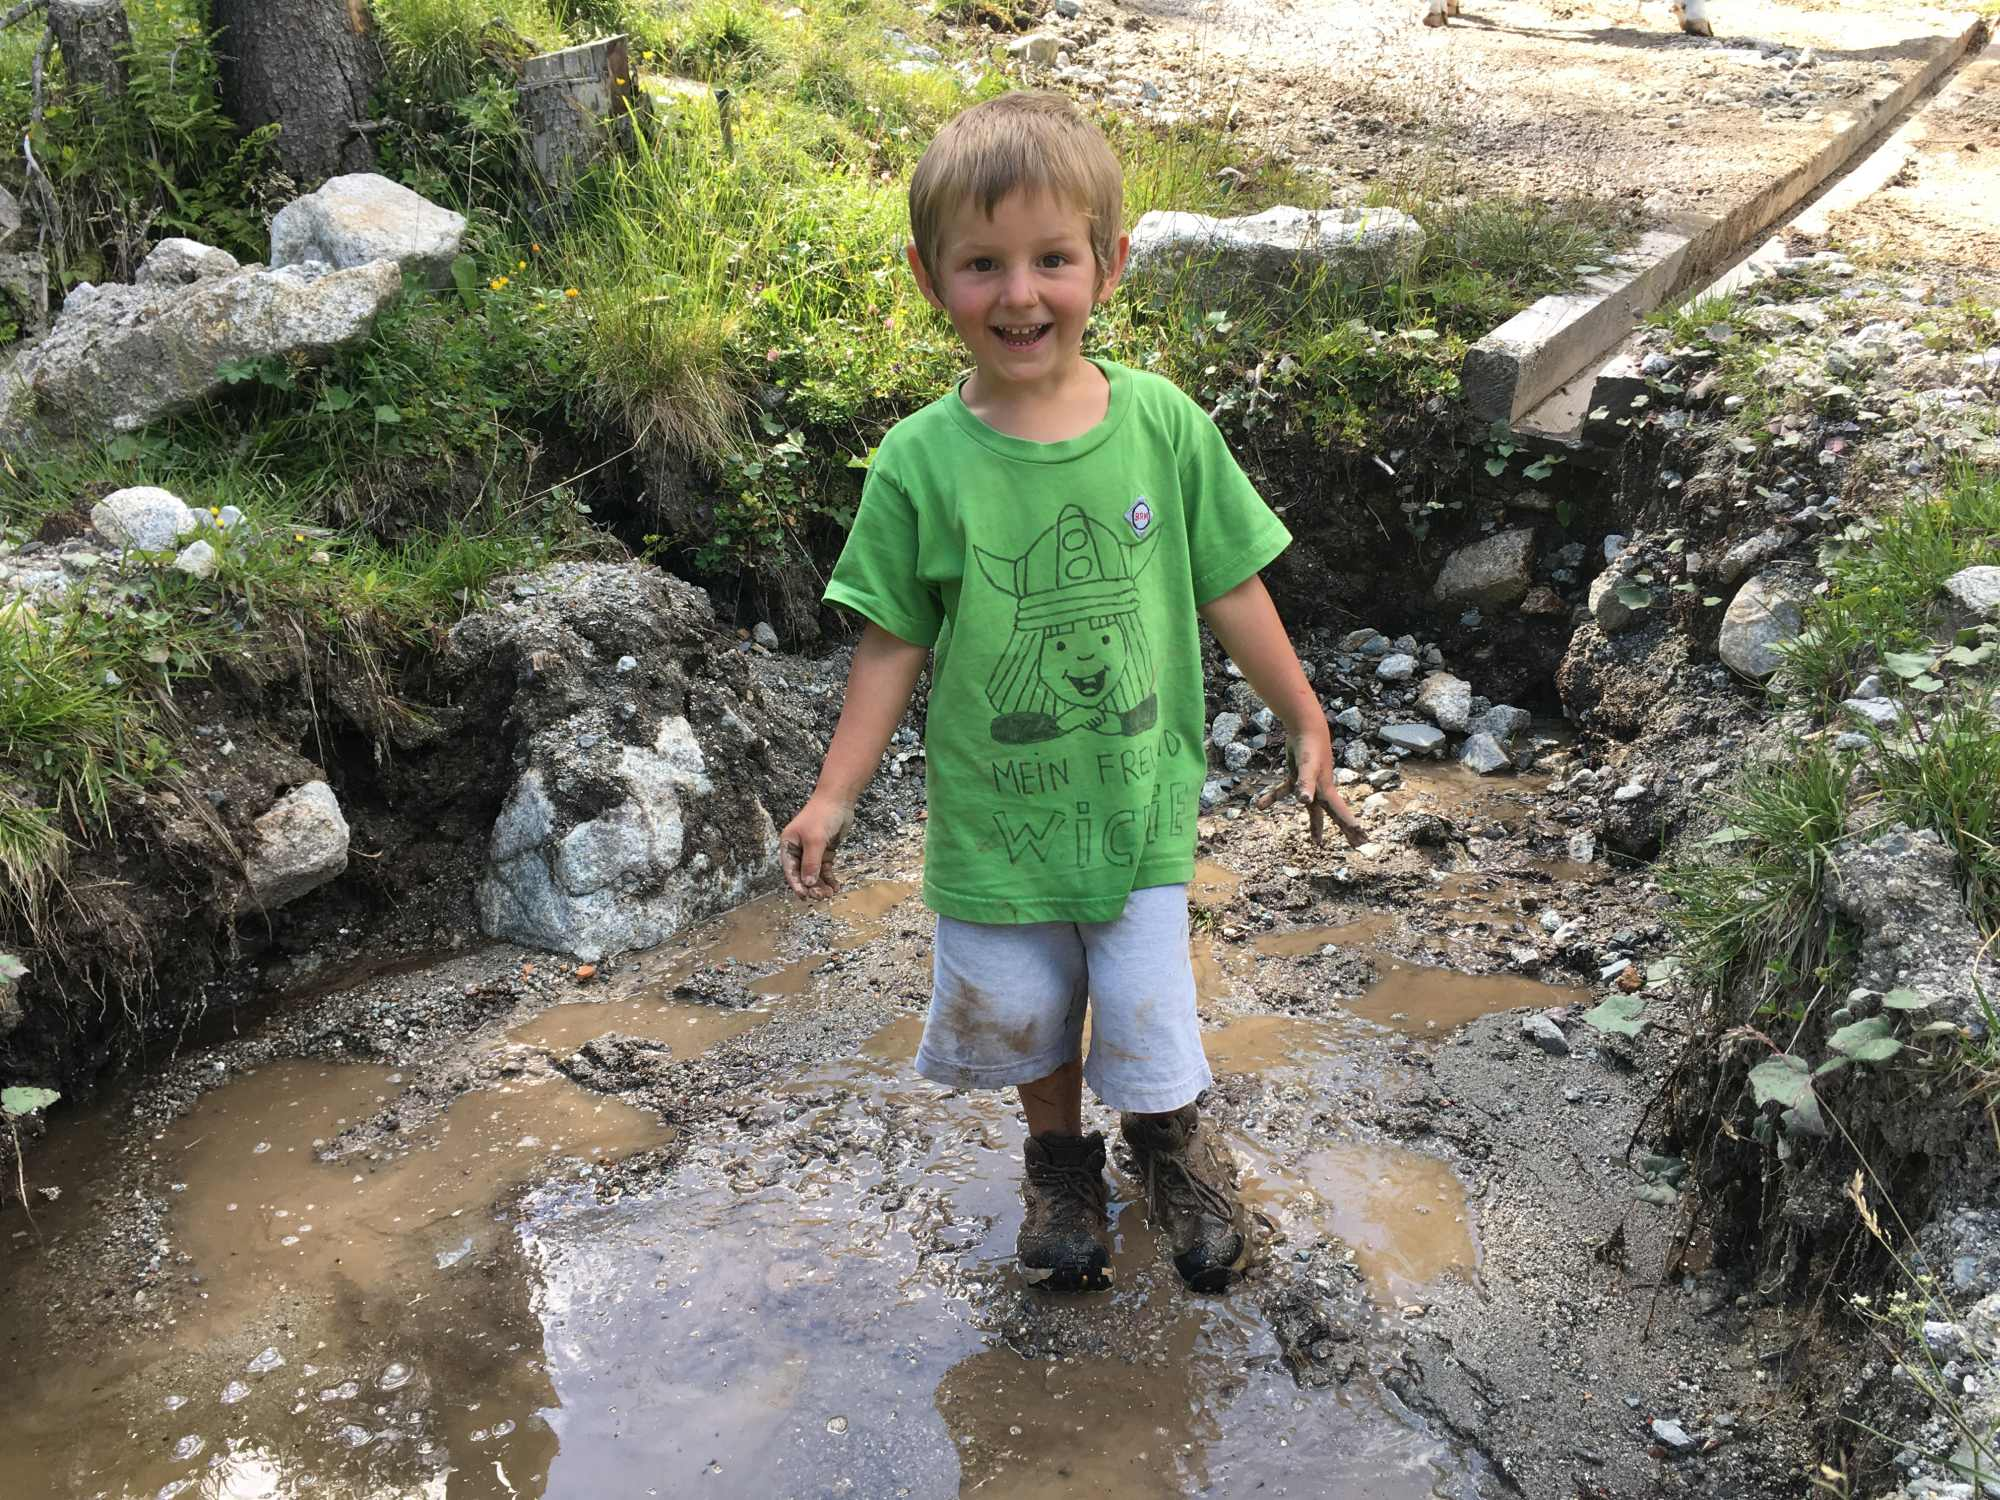 Bergsteigertipp: Einfache Lösung gegen nasse Füße